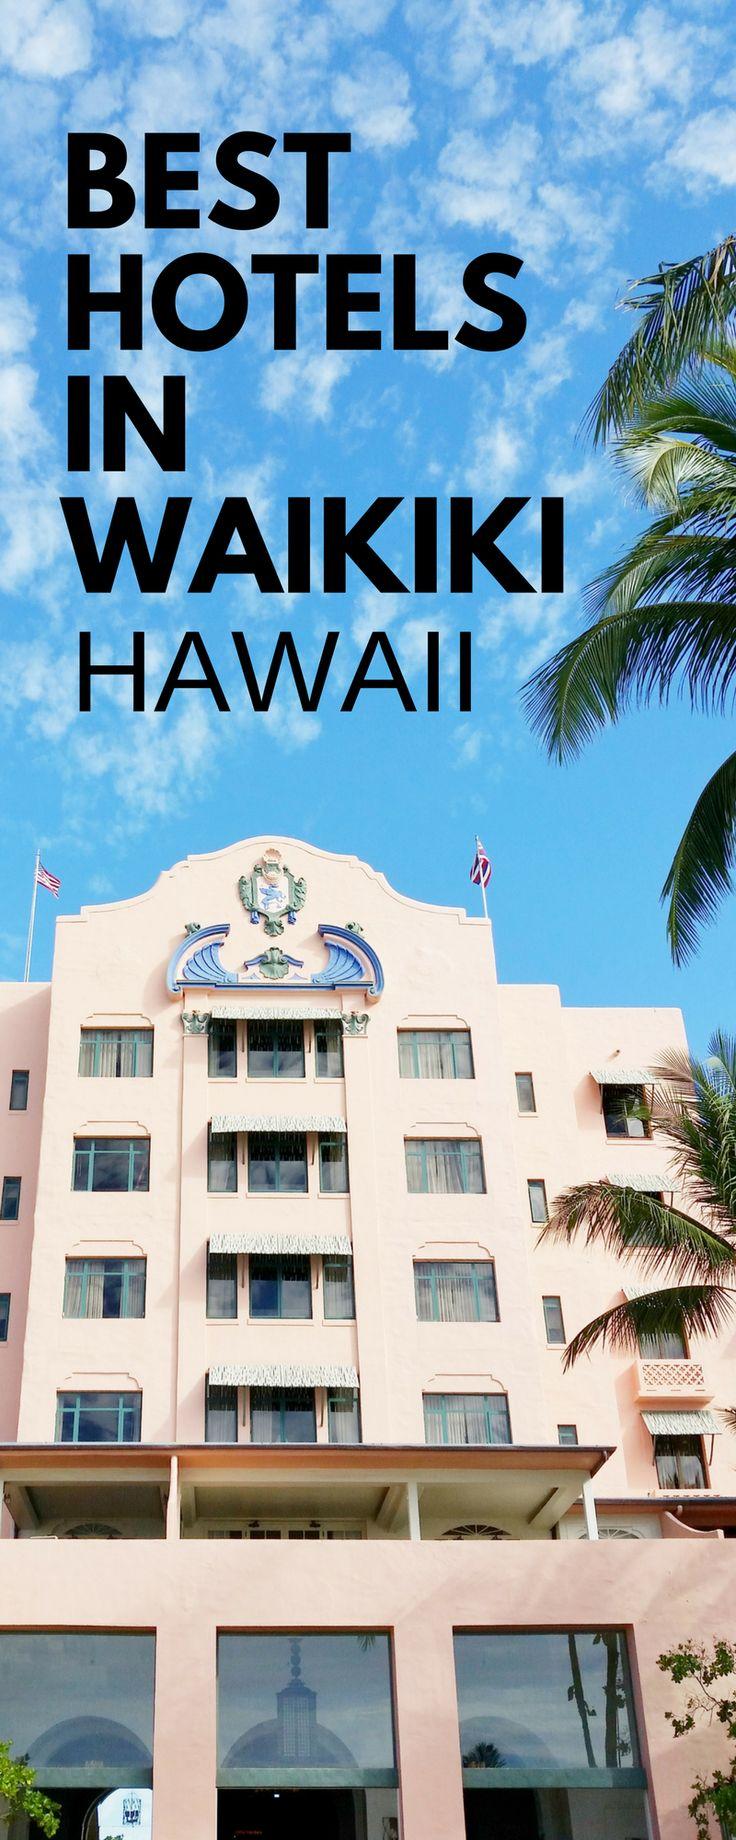 Waikiki Guide - Your Guide to Waikiki Information, Hawaii